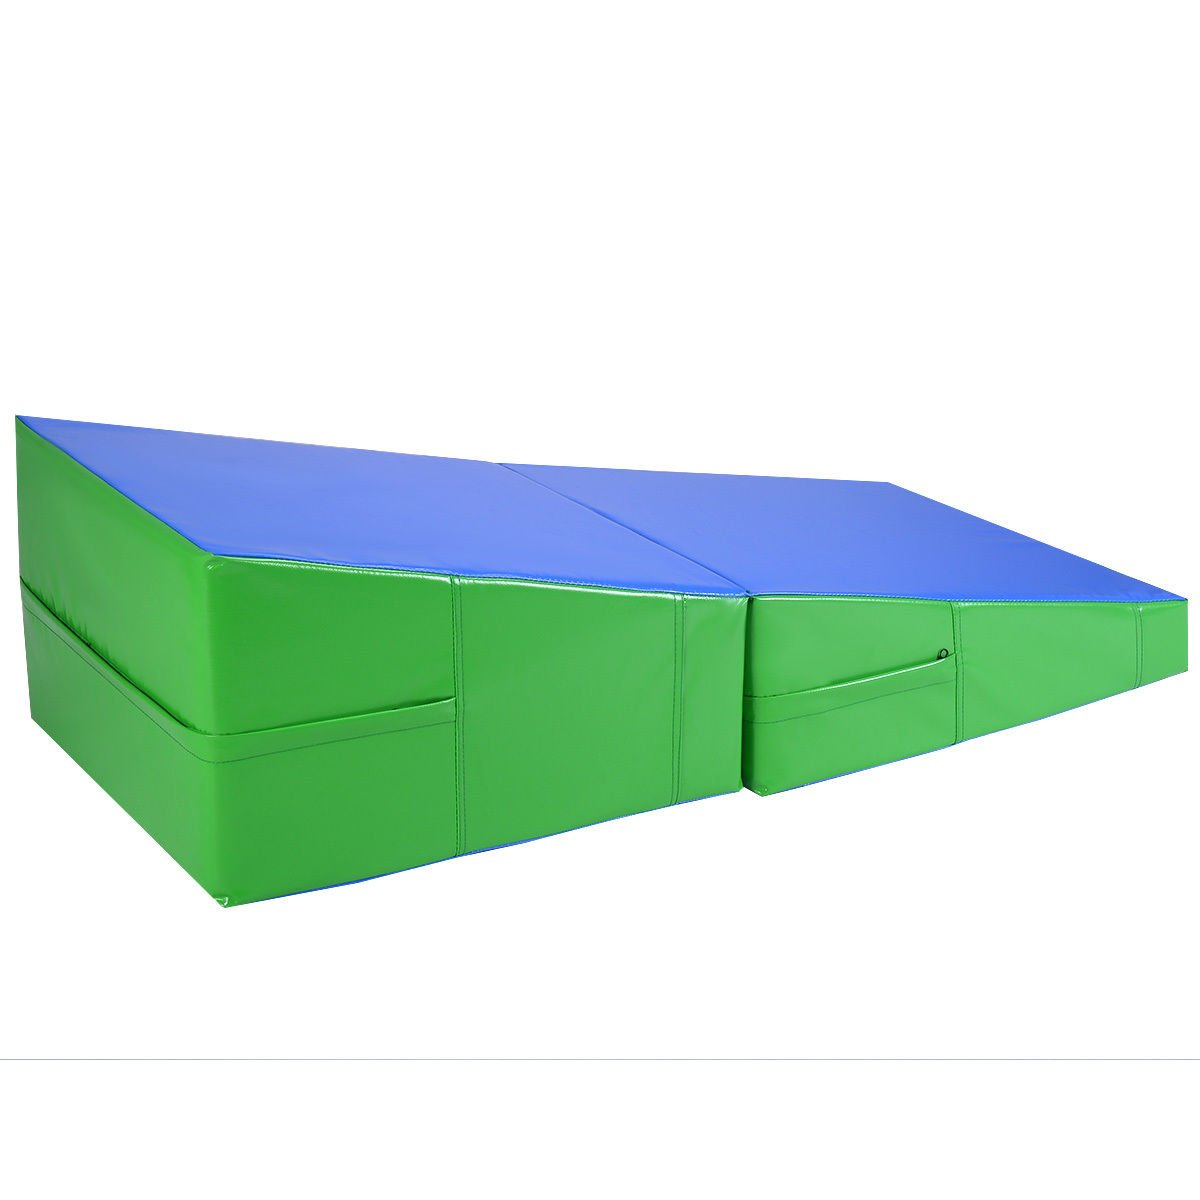 Incline Gymnastics Mat Wedge Folding Gymnastics Gym Fitness Tumbling 48''x24''x14'' by BUY JOY (Image #2)